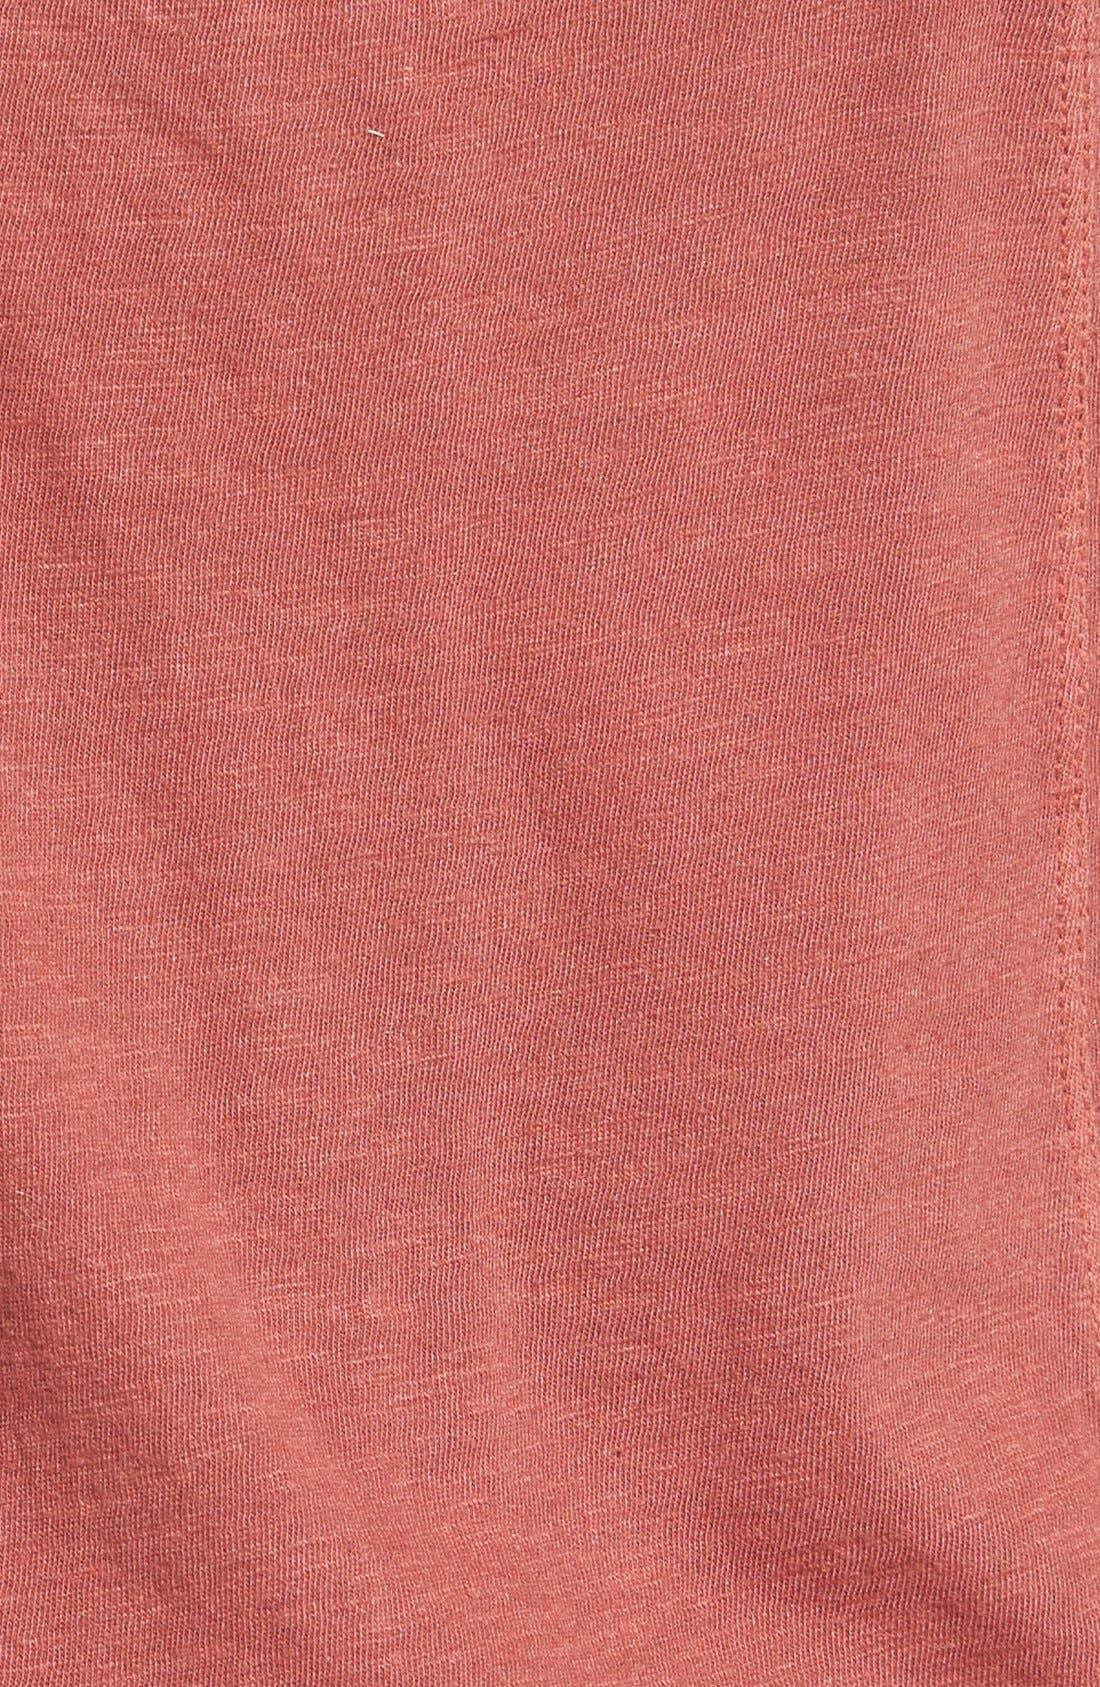 Alternate Image 3  - Sun & Shadow Embroidered Crop Camisole (Juniors)